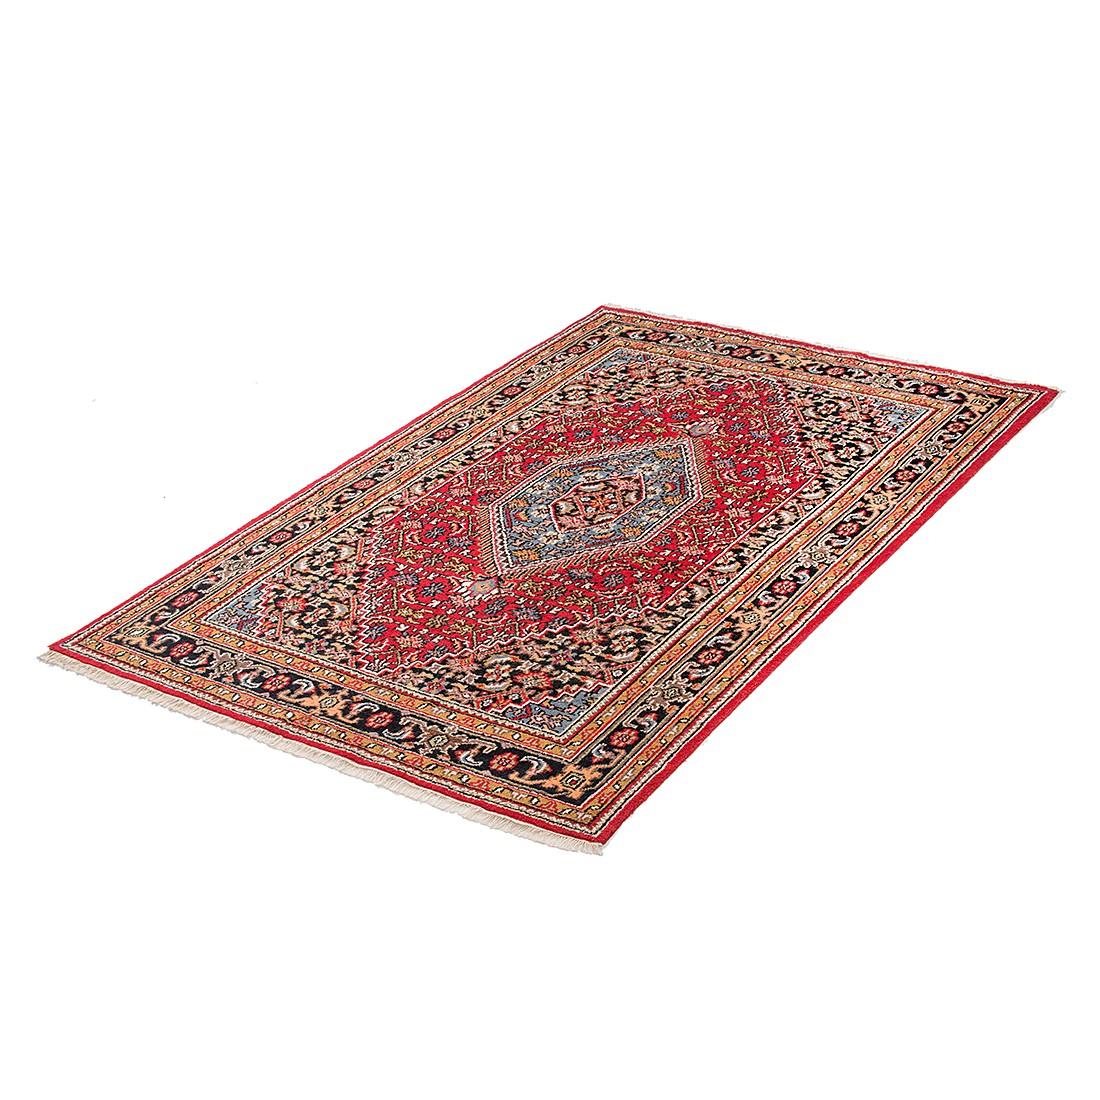 Tapijt Indo Hyderabad - rood - wol - 70x140cm, Parwis